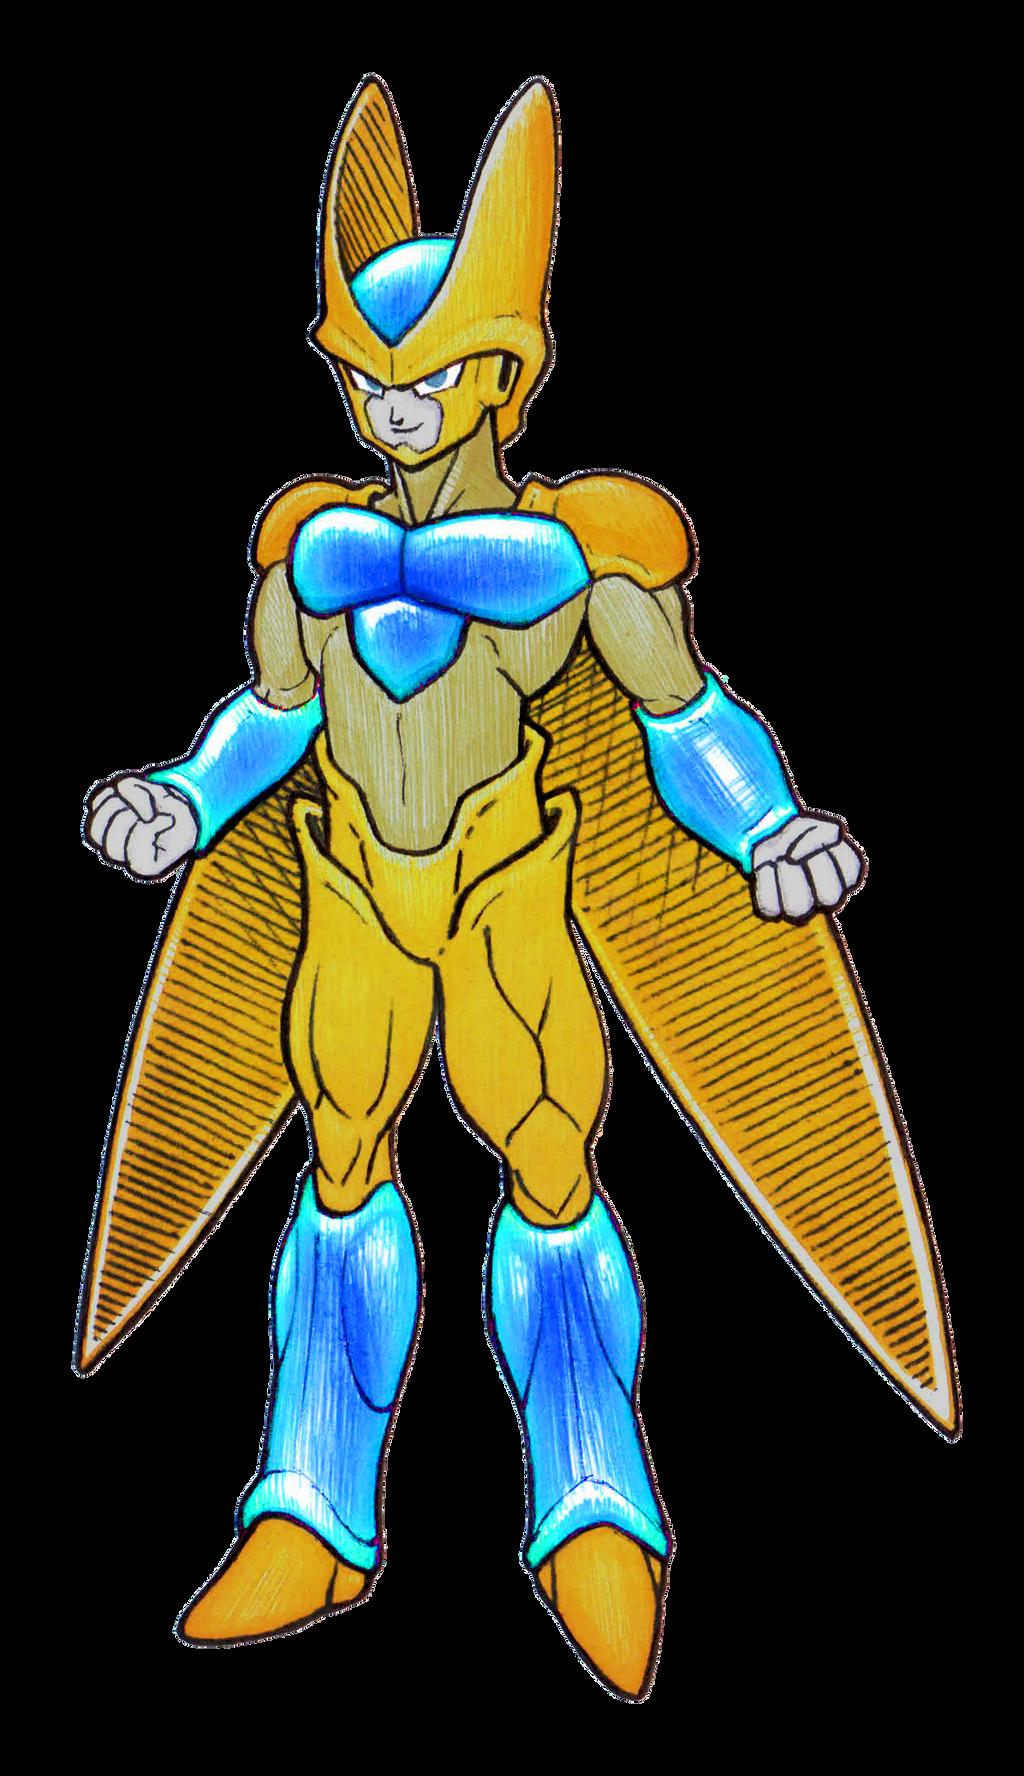 Super golden cell by dragonboytanton on deviantart - Super cell dbz ...